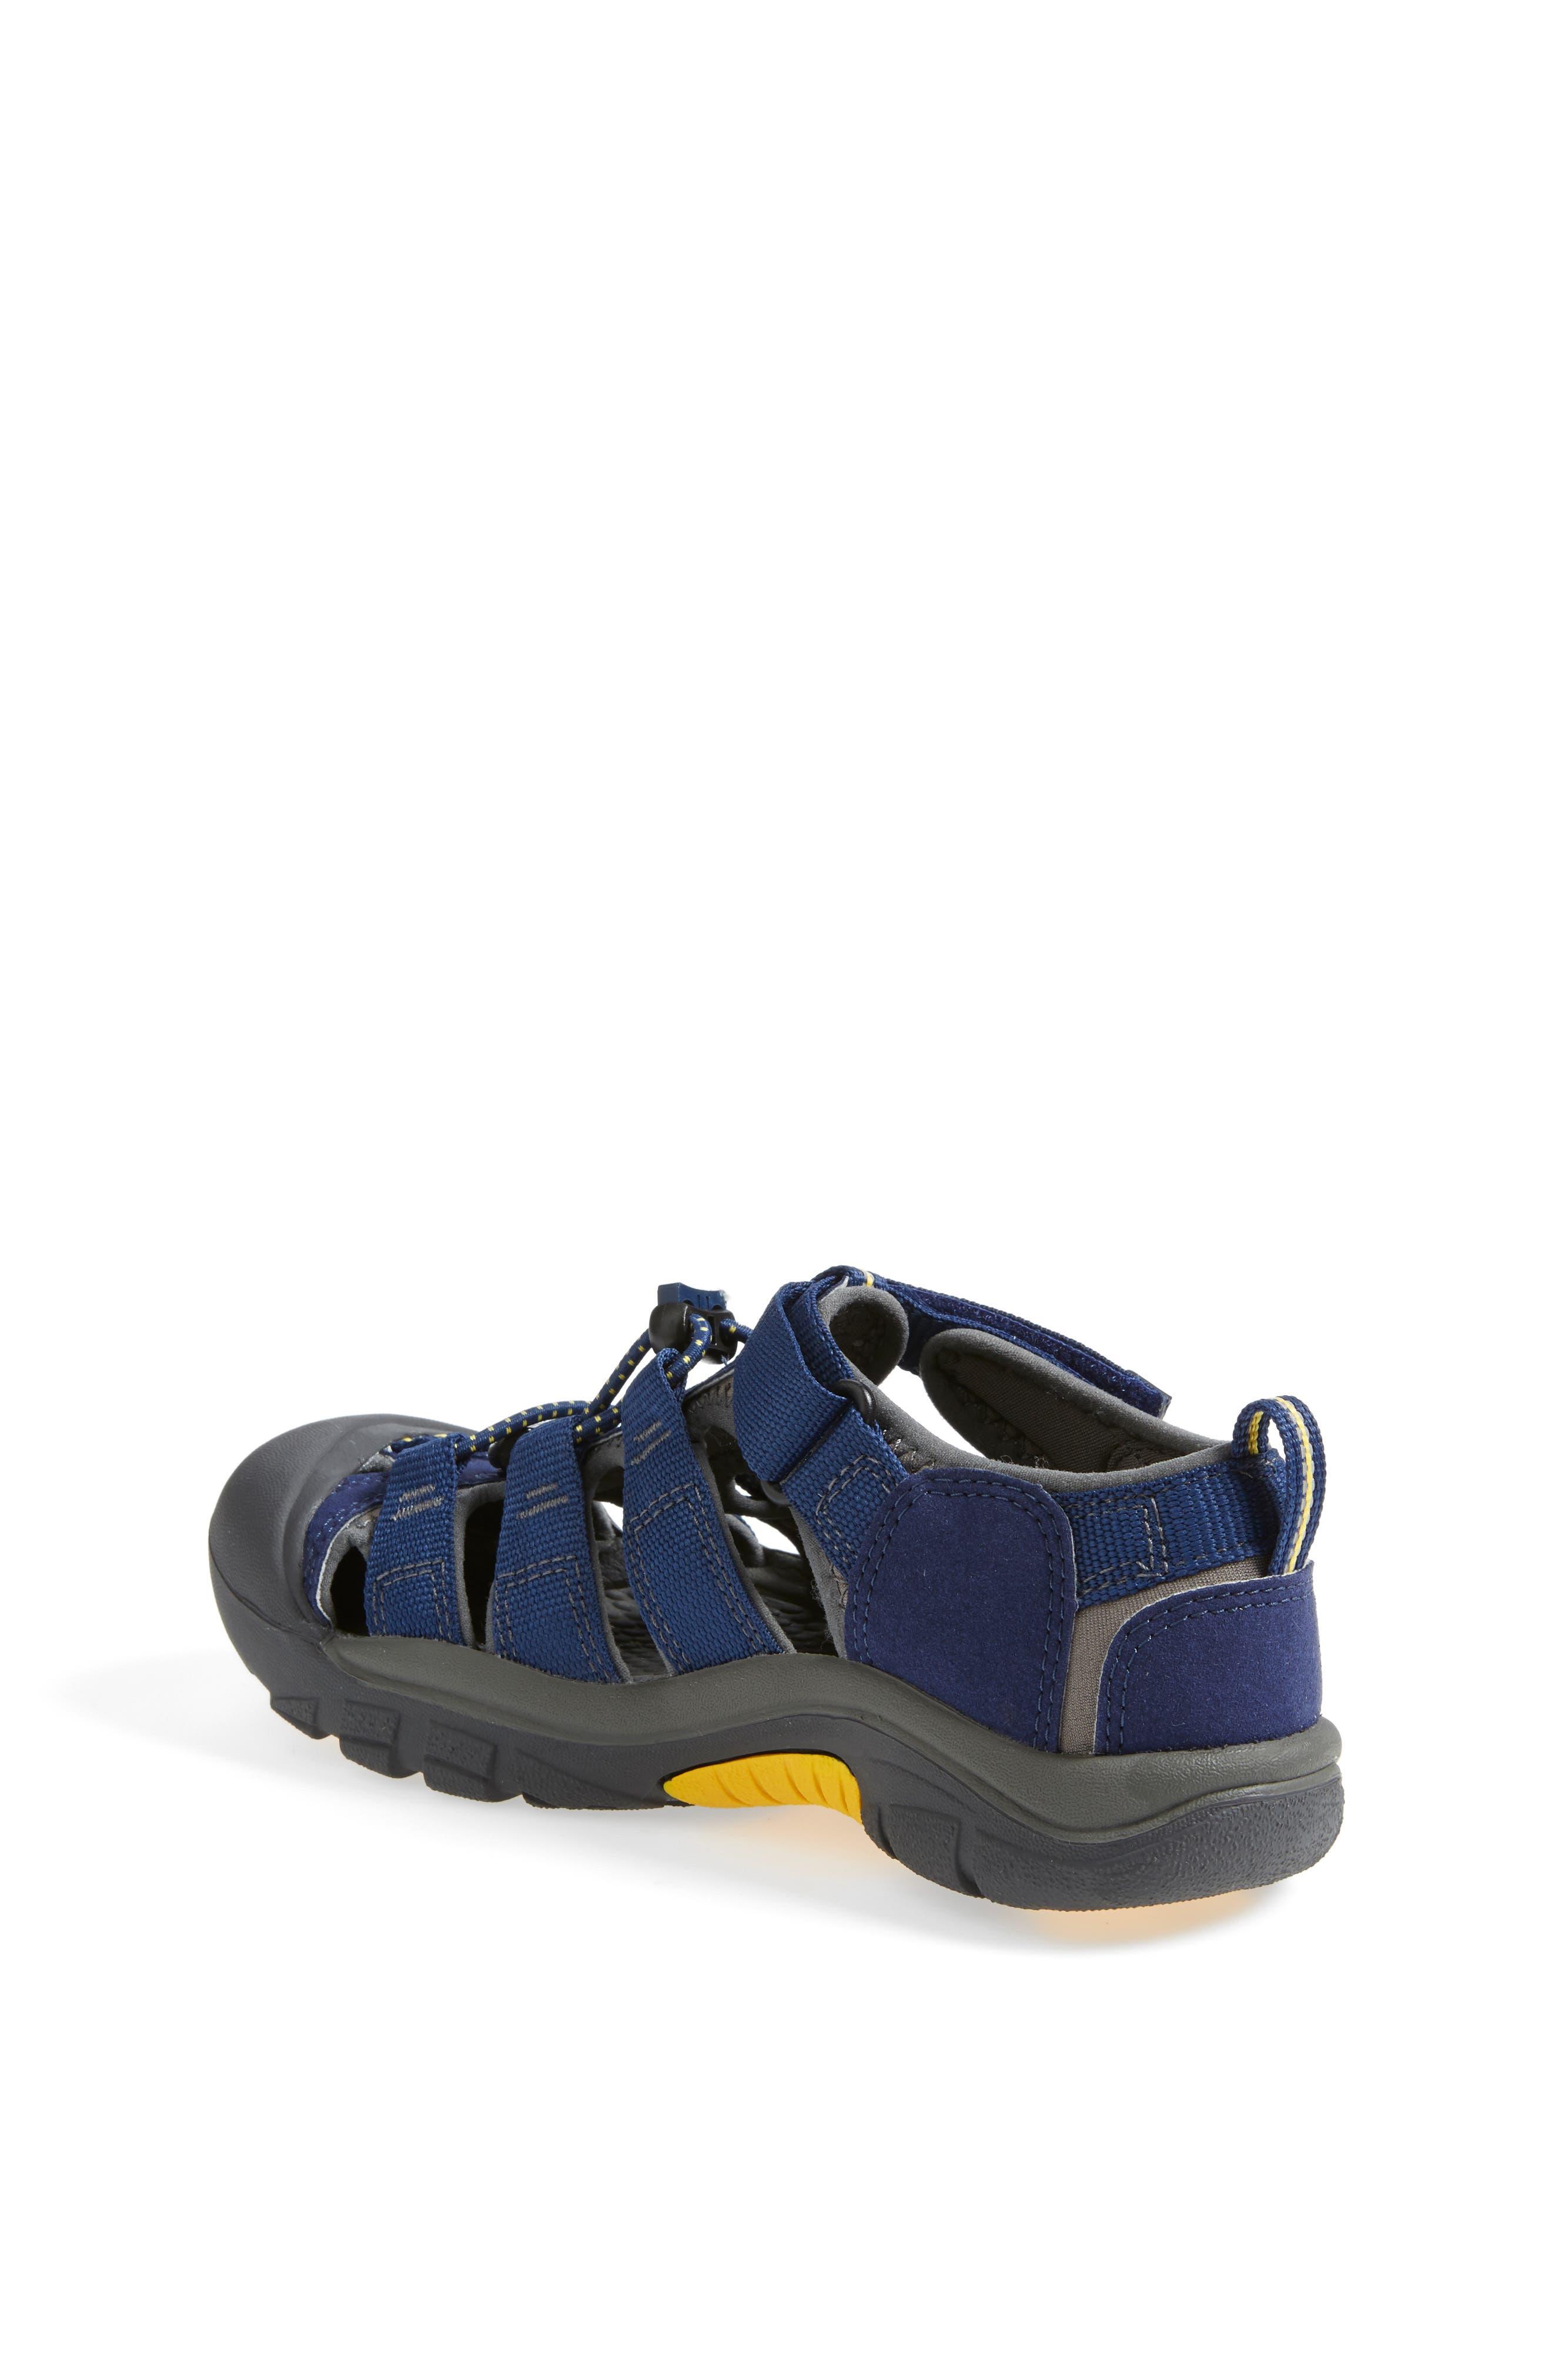 'Newport H2' Water Friendly Sandal,                             Alternate thumbnail 2, color,                             BLUE DEPTHS